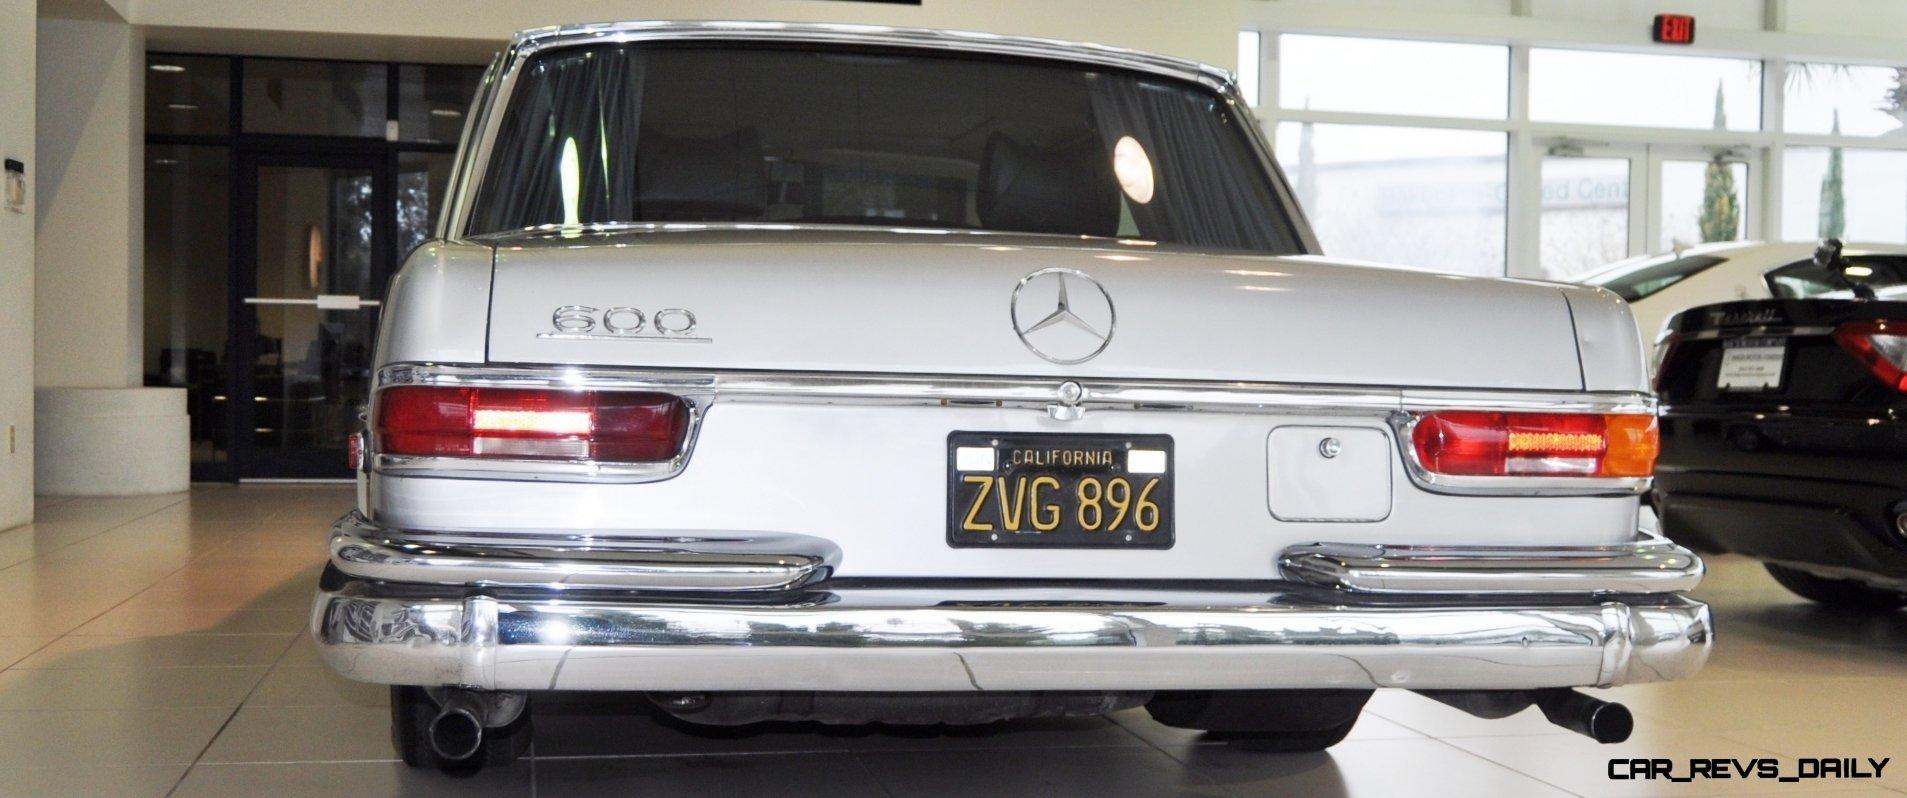 Update1 1970 Mercedes Benz 600 Pullman Swb For 75 000 In Charleston South Carolina